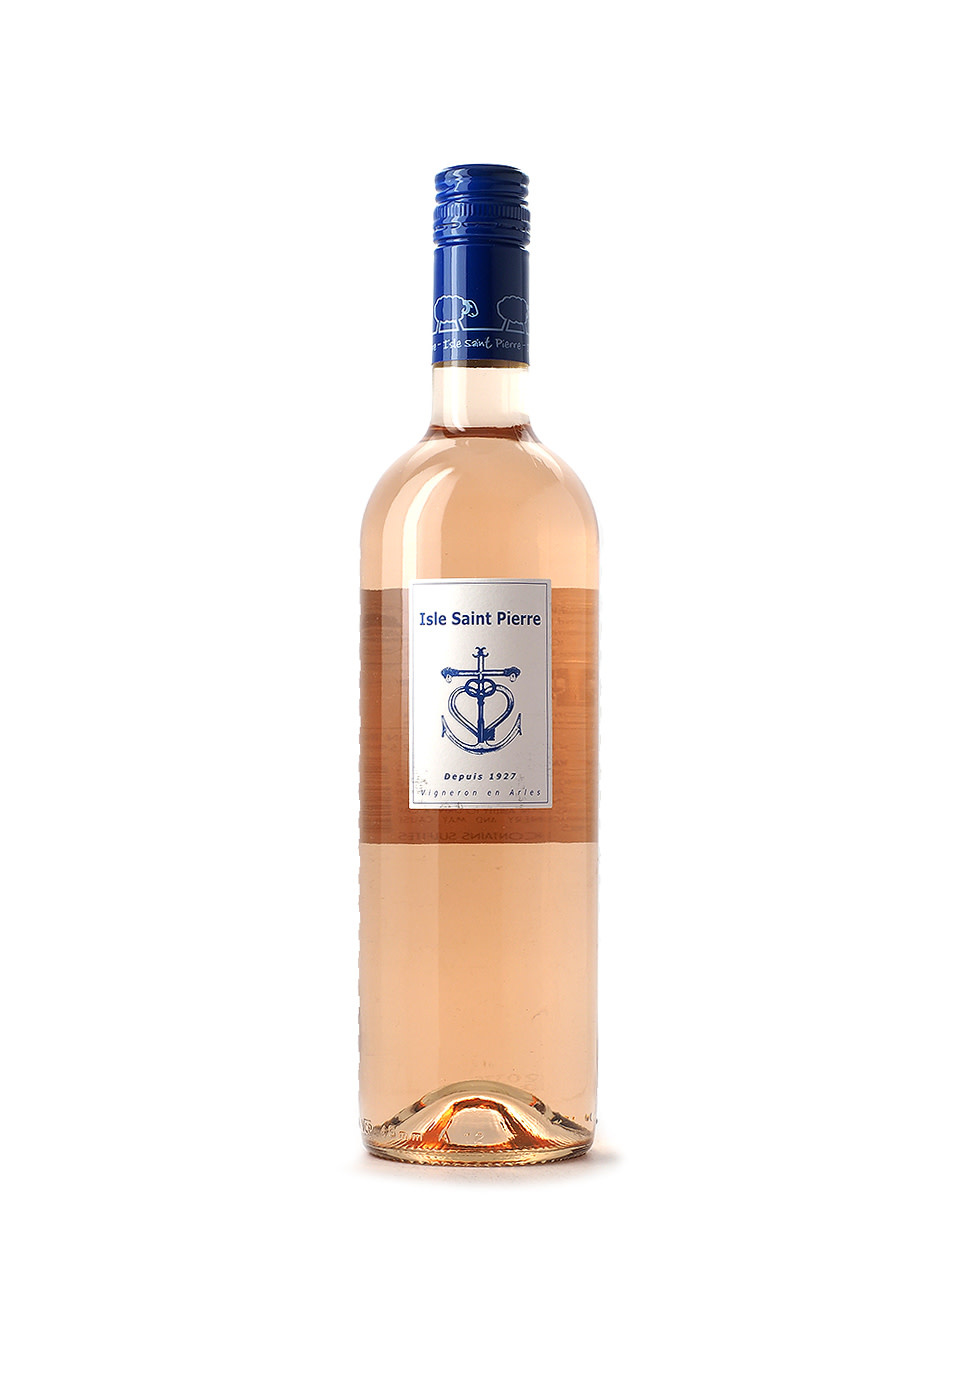 Isle Saint Pierre Vin de Pays de Mediterranee Rose 2020